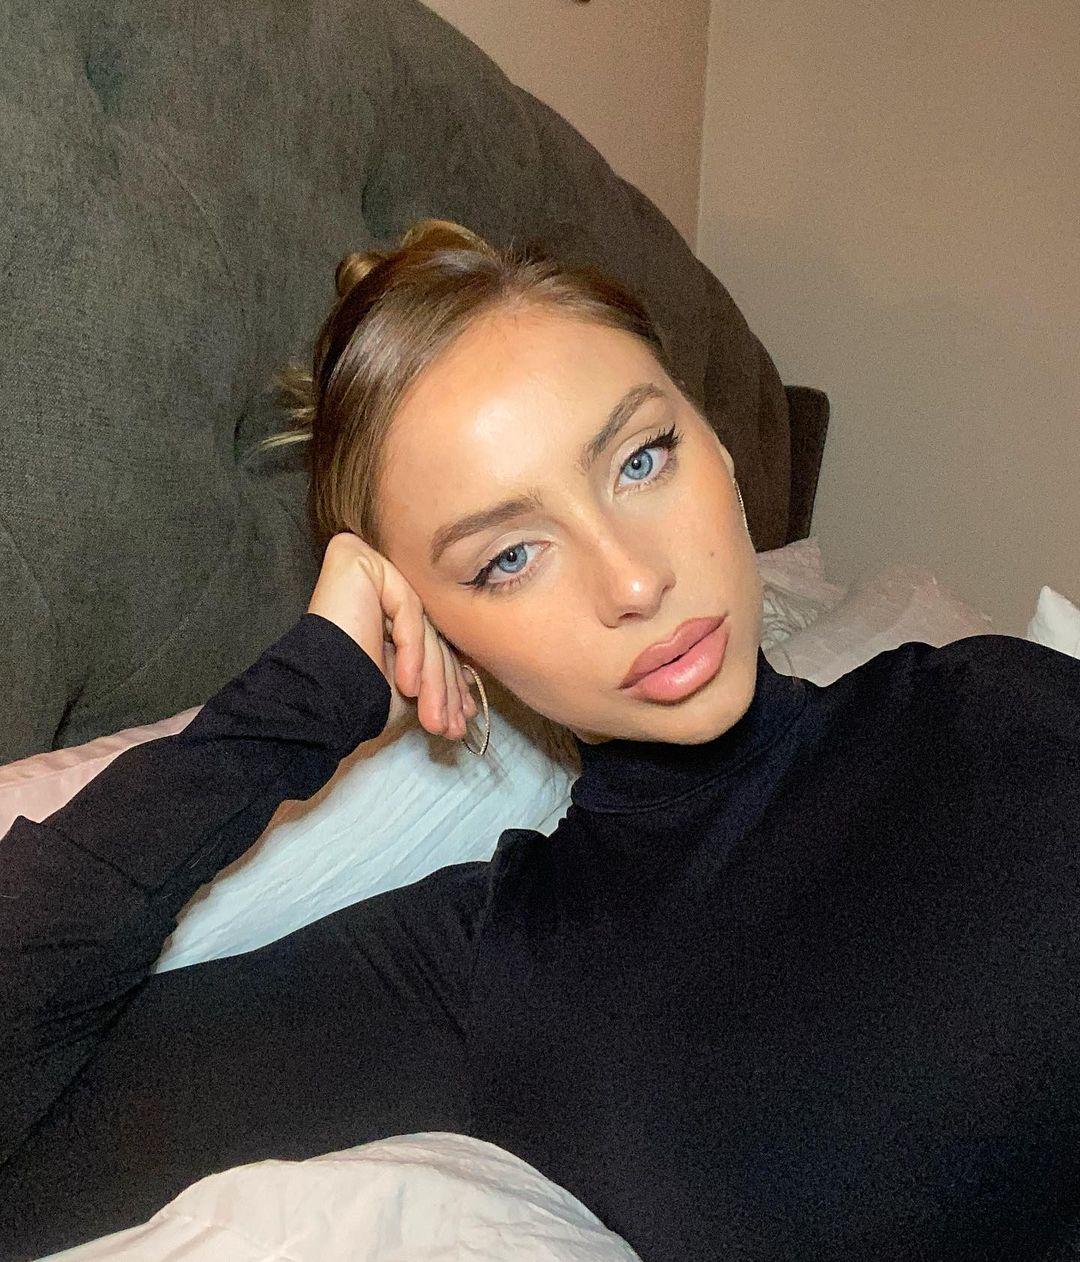 Stephanie-Weiss-Wallpapers-Insta-Fit-Bio-9